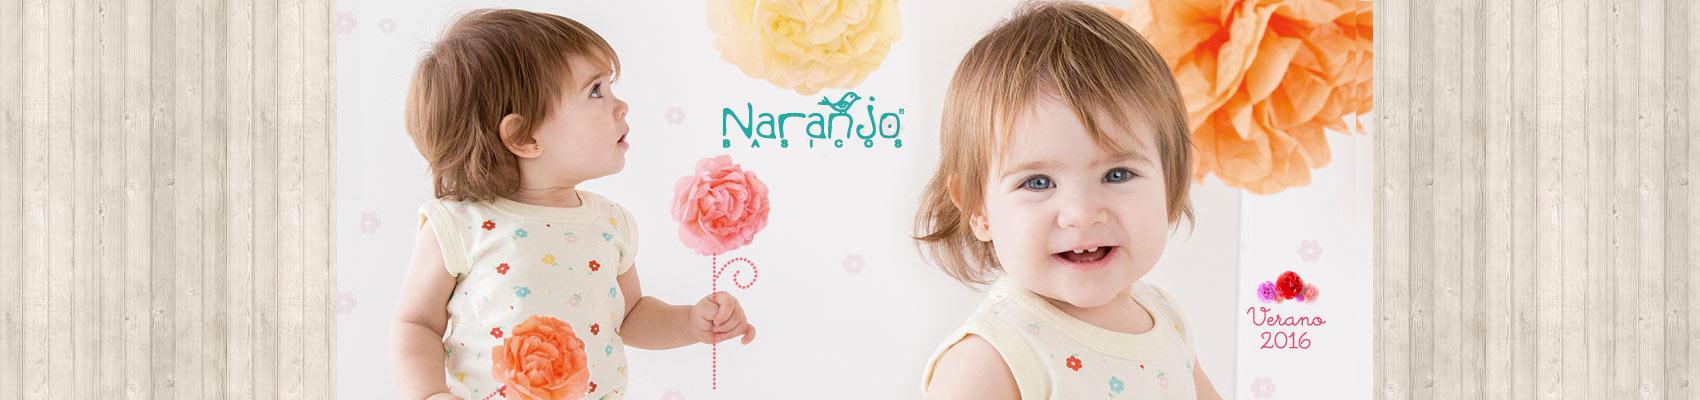 naranjo-banner